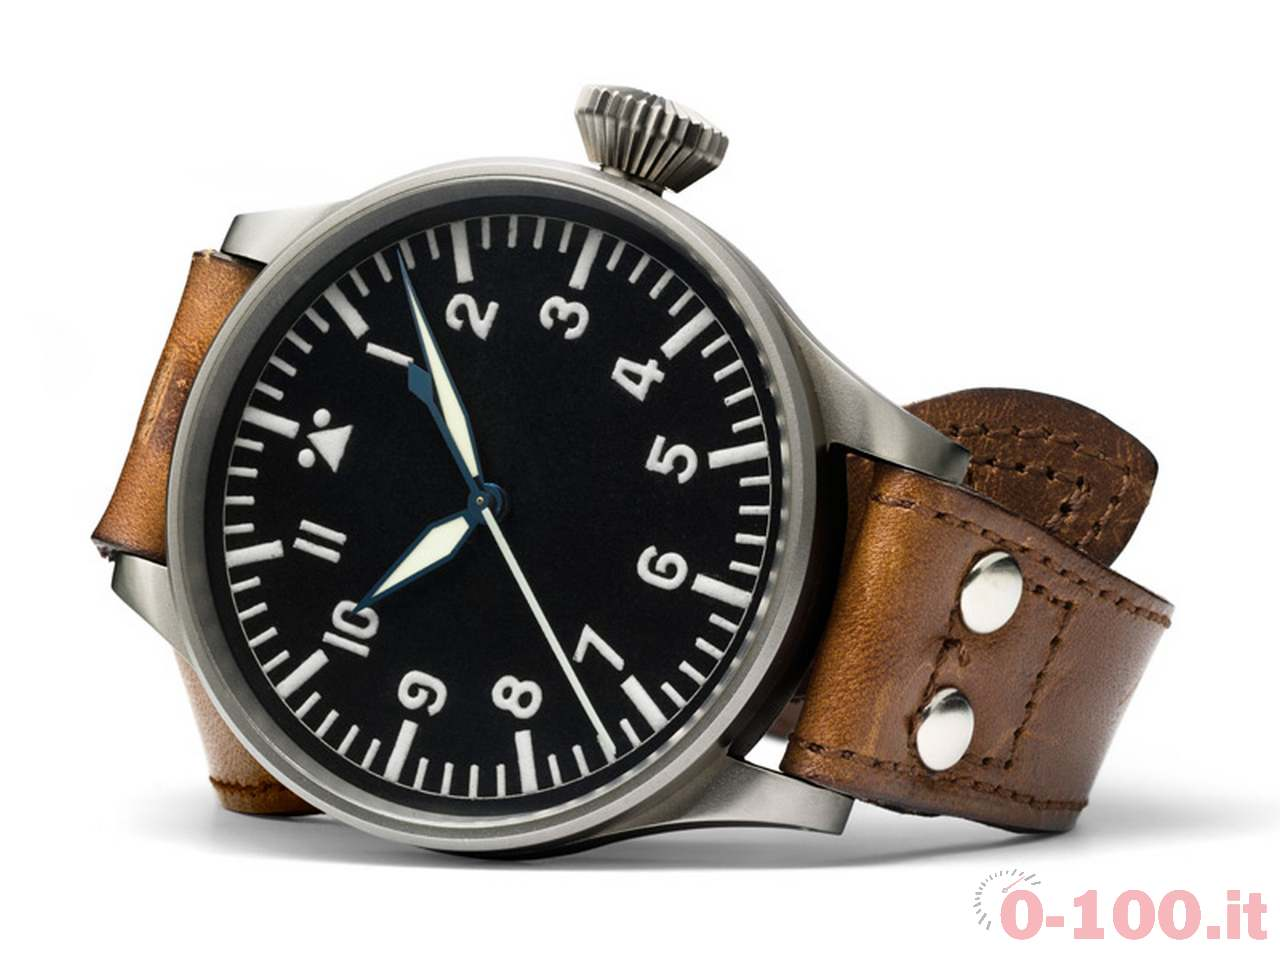 Iwc Gran Reloj de Aviador ref. IW 431_0-100